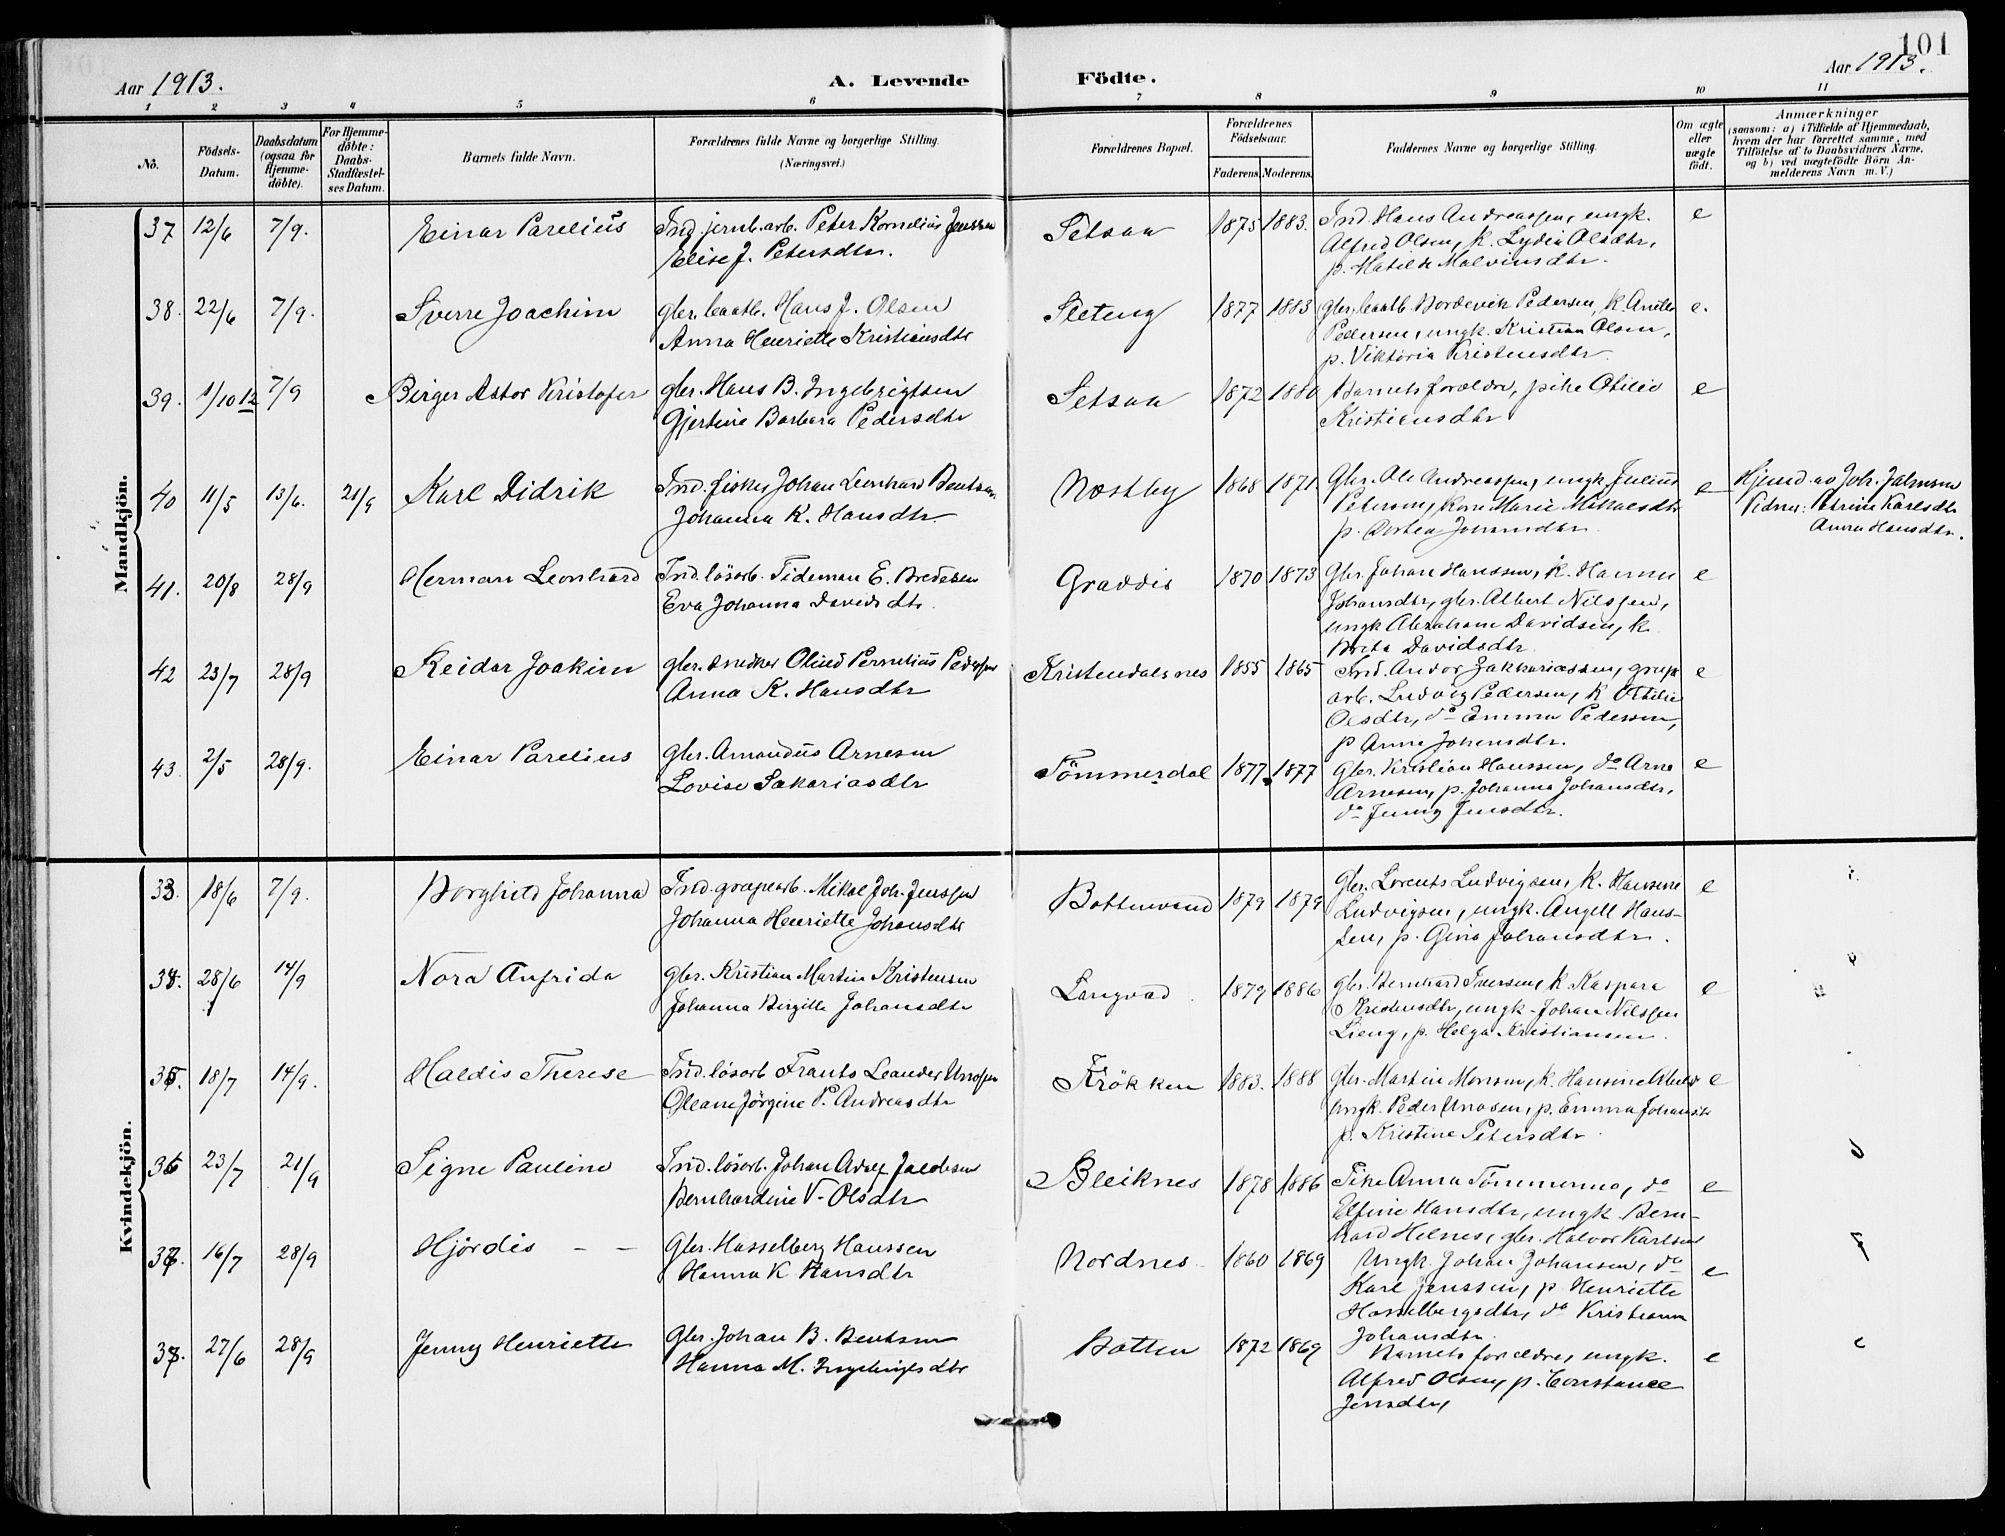 SAT, Ministerialprotokoller, klokkerbøker og fødselsregistre - Nordland, 847/L0672: Ministerialbok nr. 847A12, 1902-1919, s. 101